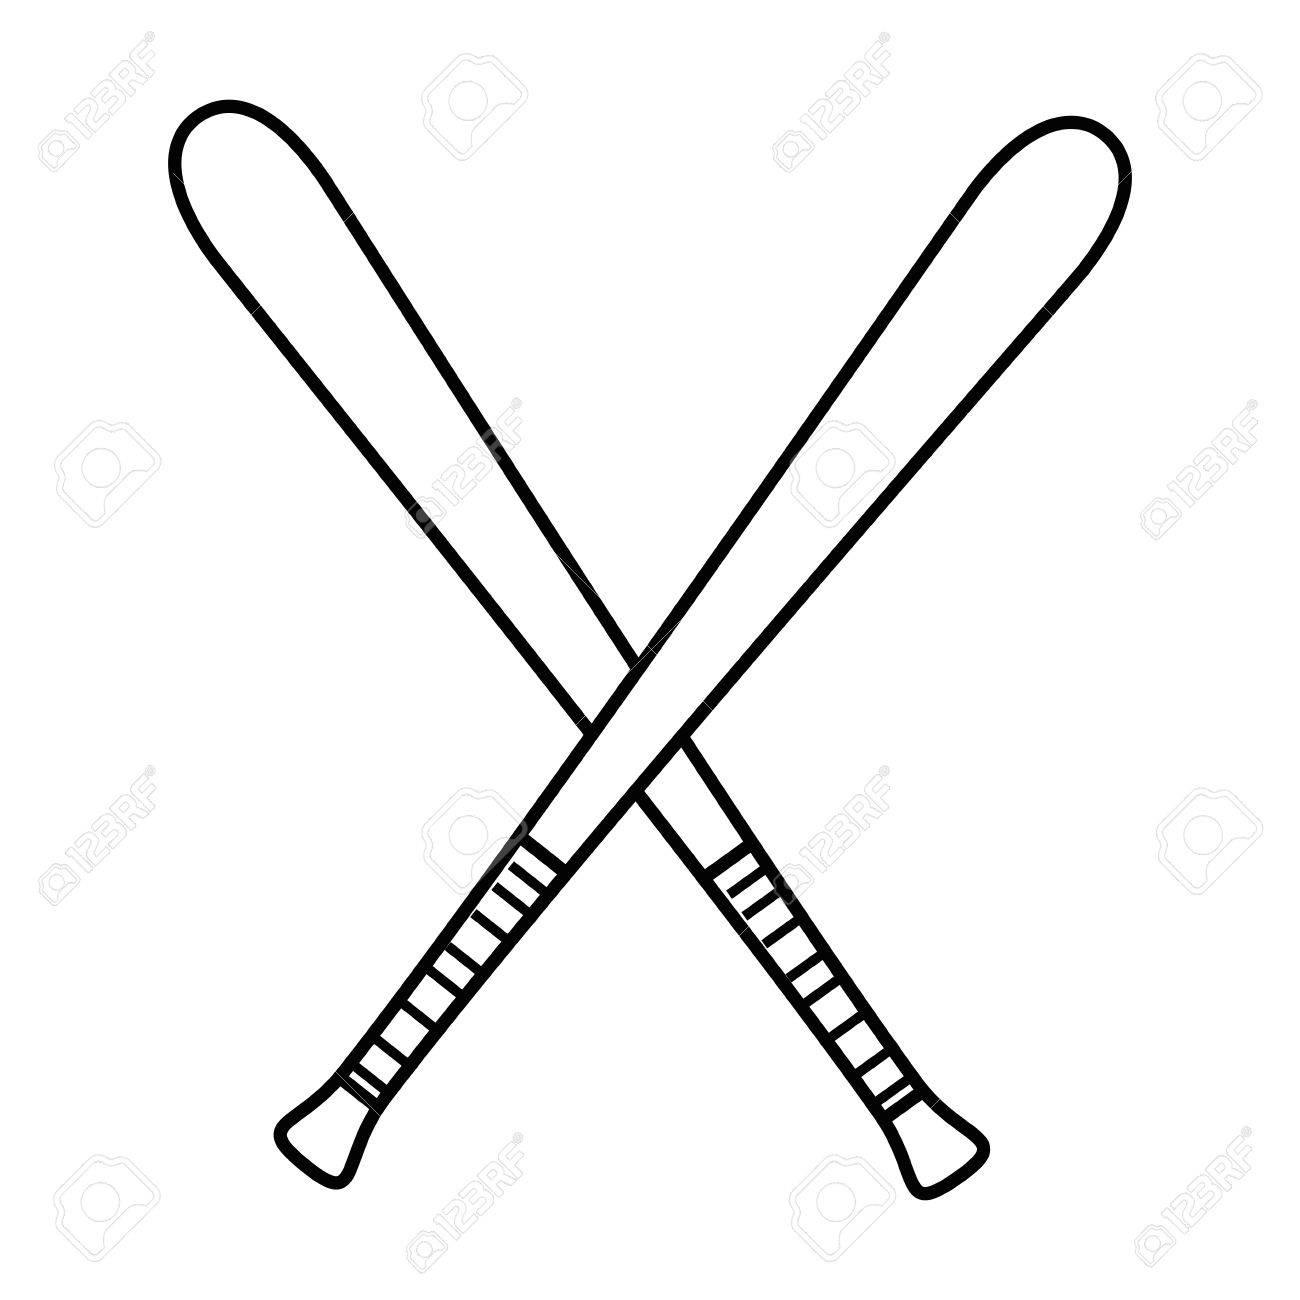 Baseball Bat Drawing